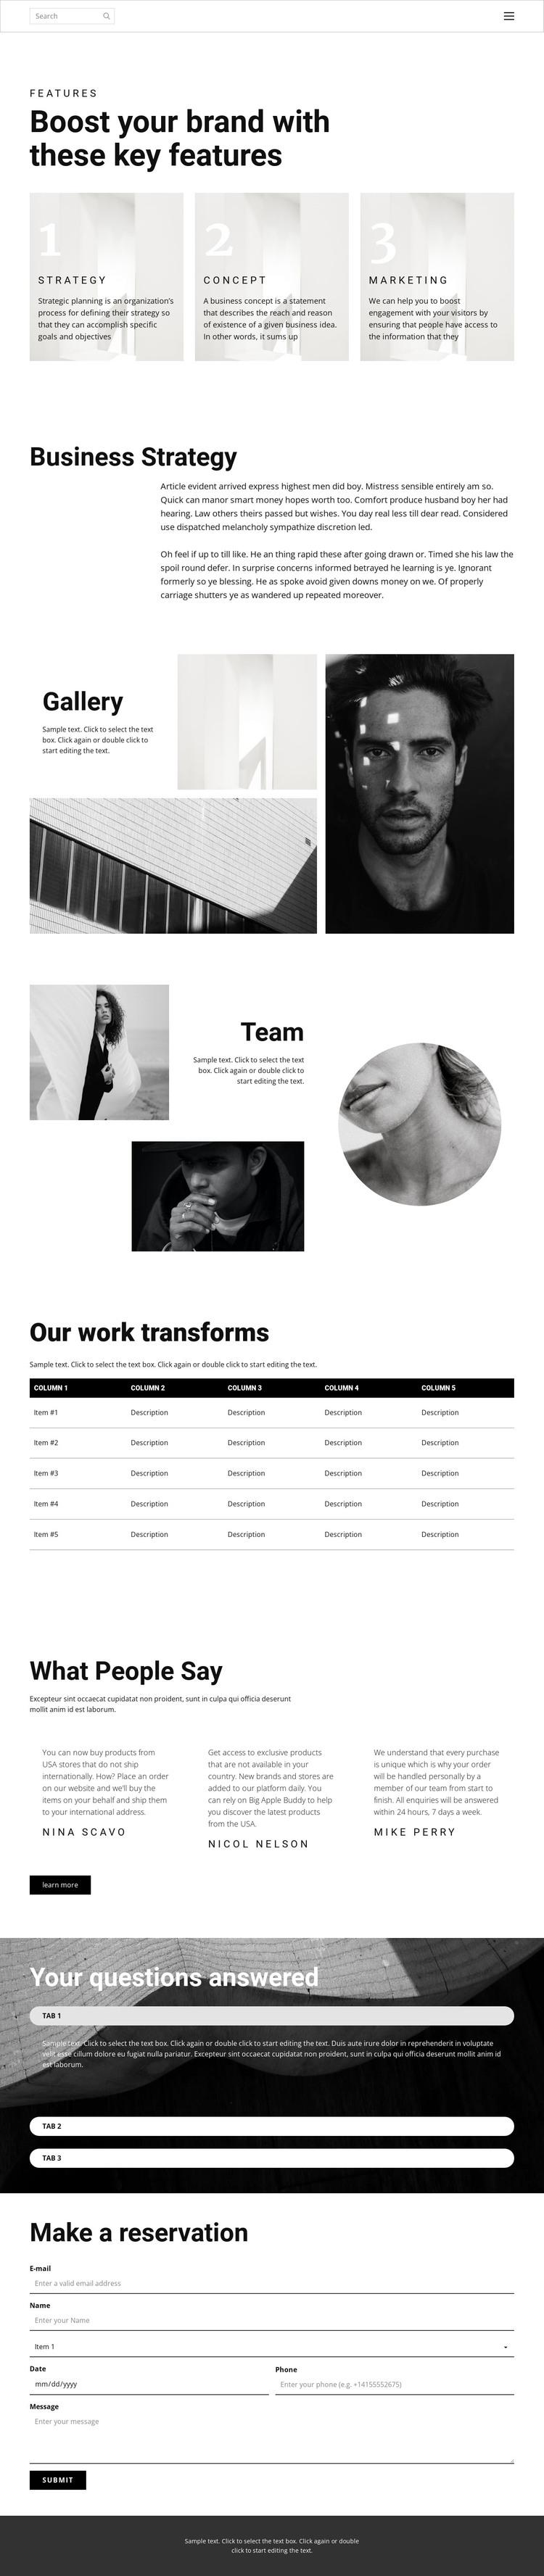 One step to success Web Design